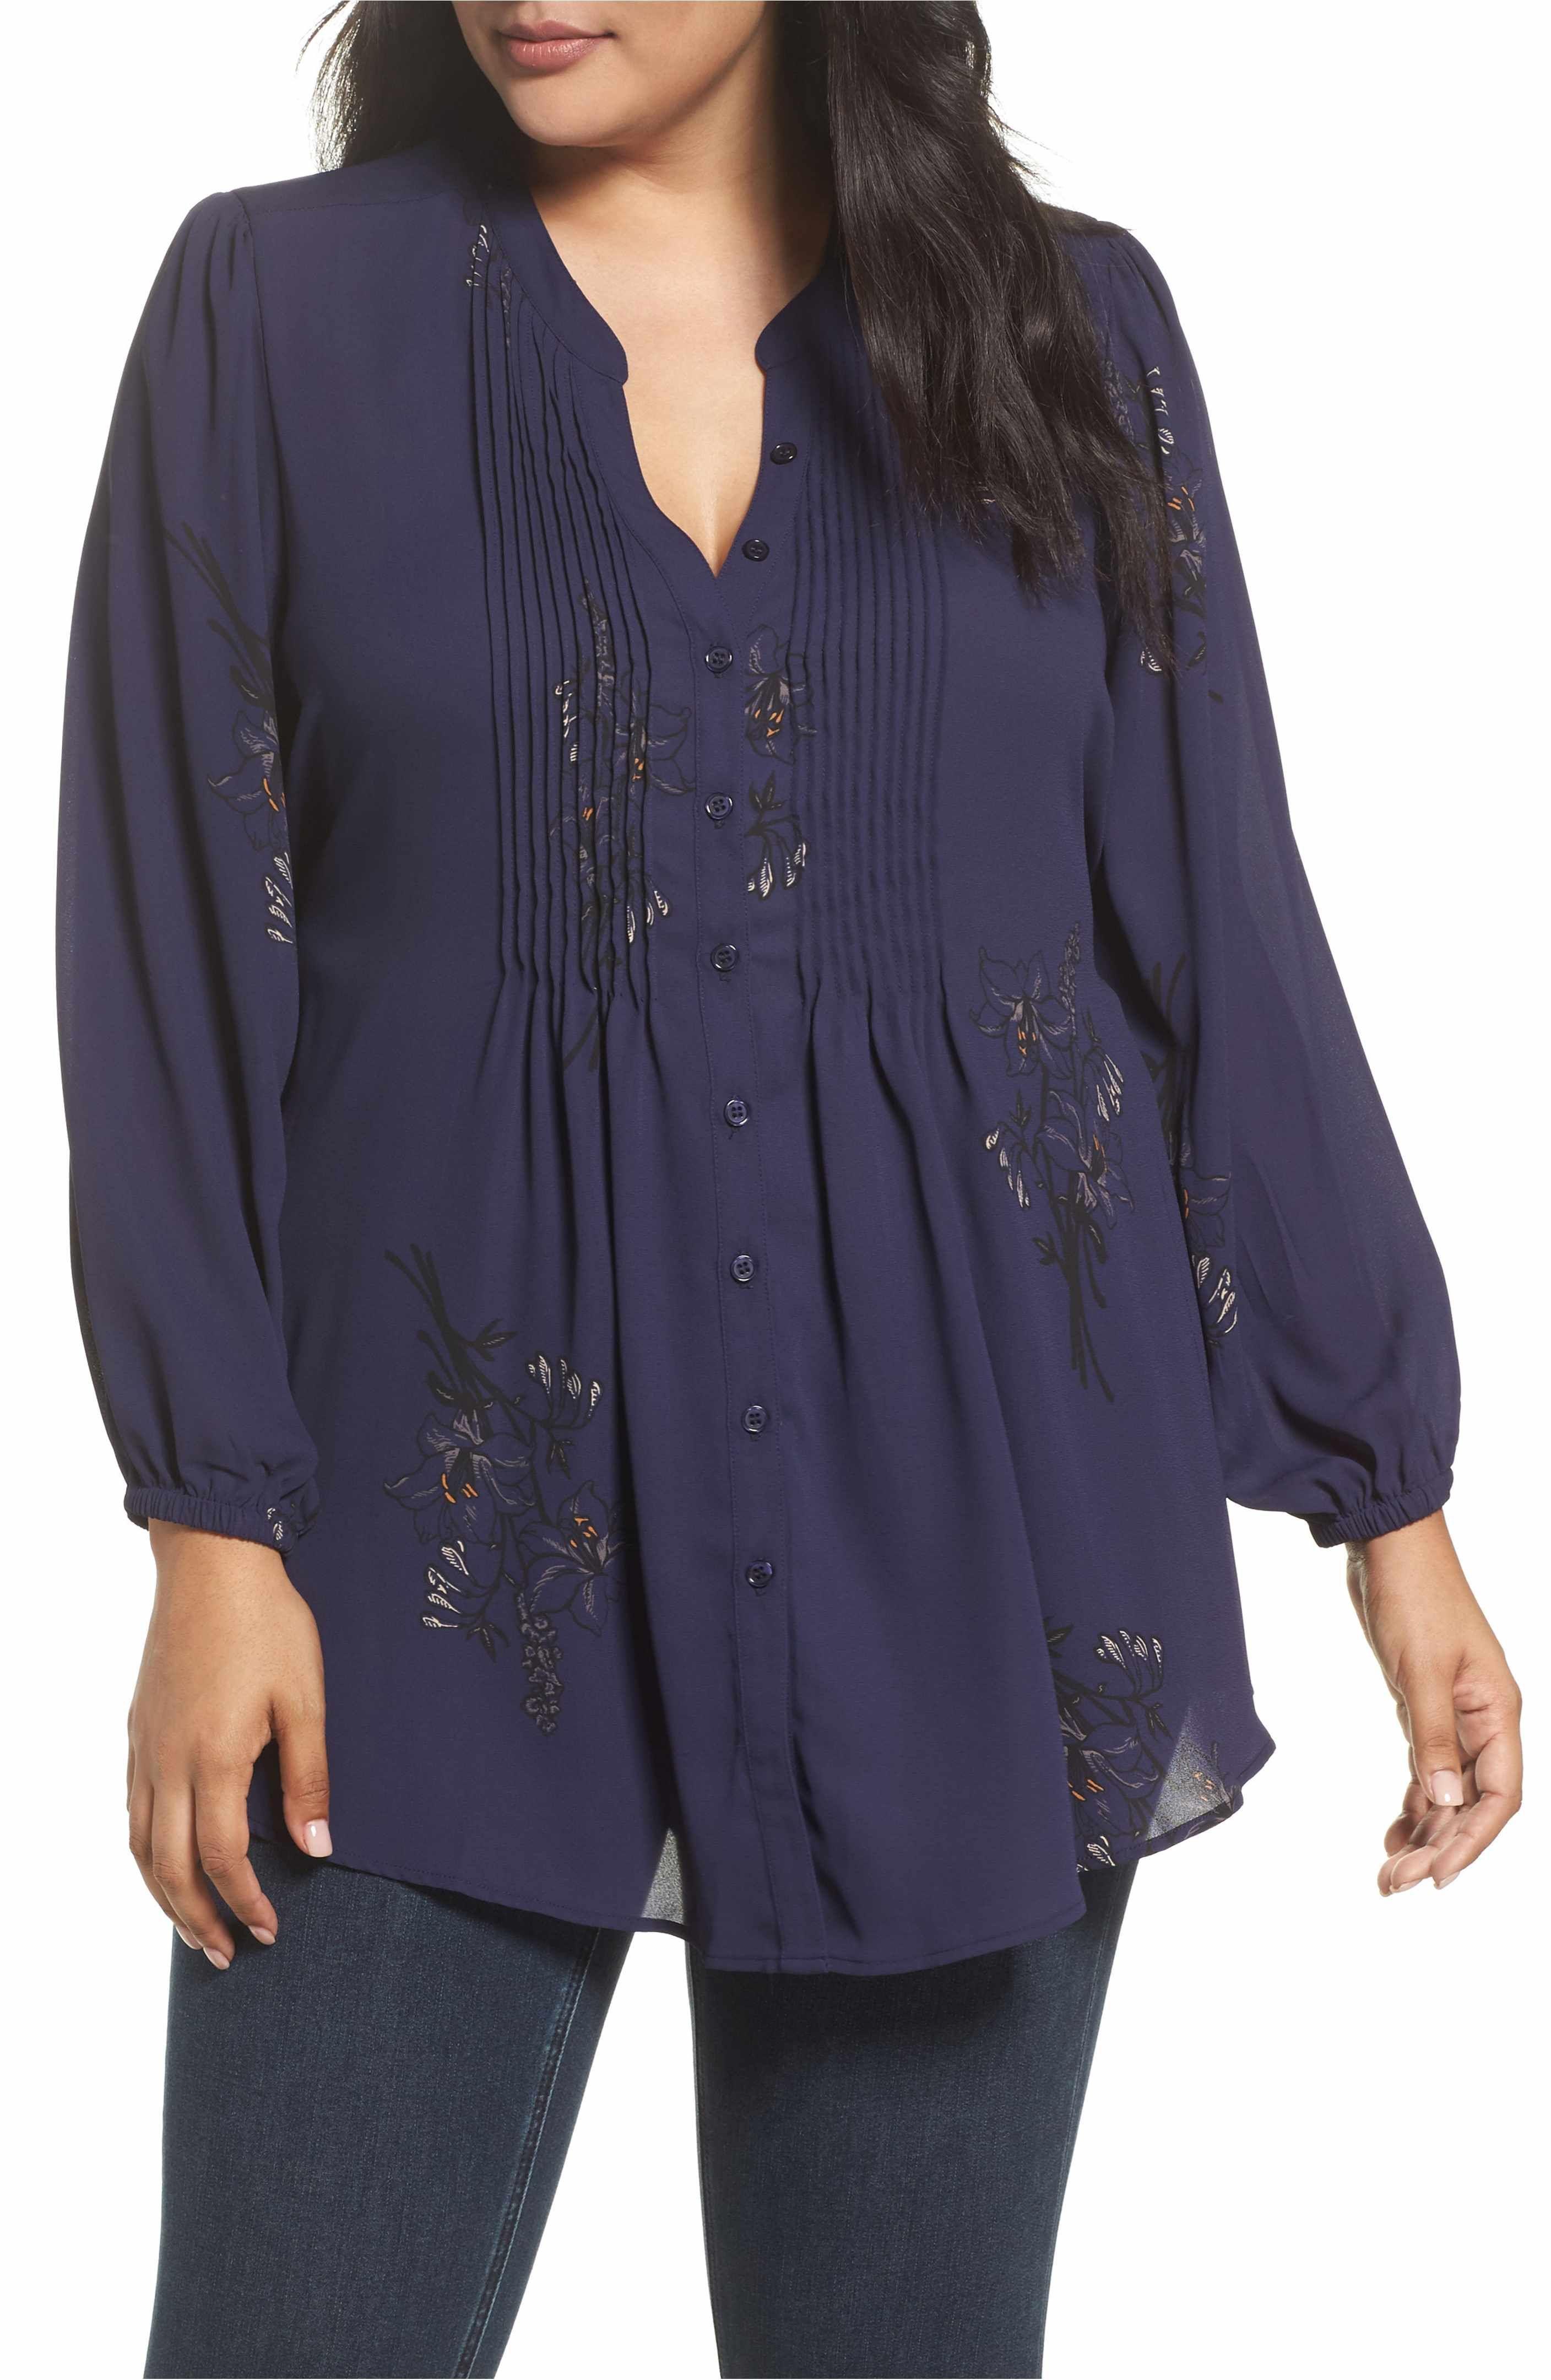 6b6812c936acb Main Image - Melissa McCarthy Seven7 Classic Pintuck Shirt (Plus Size)